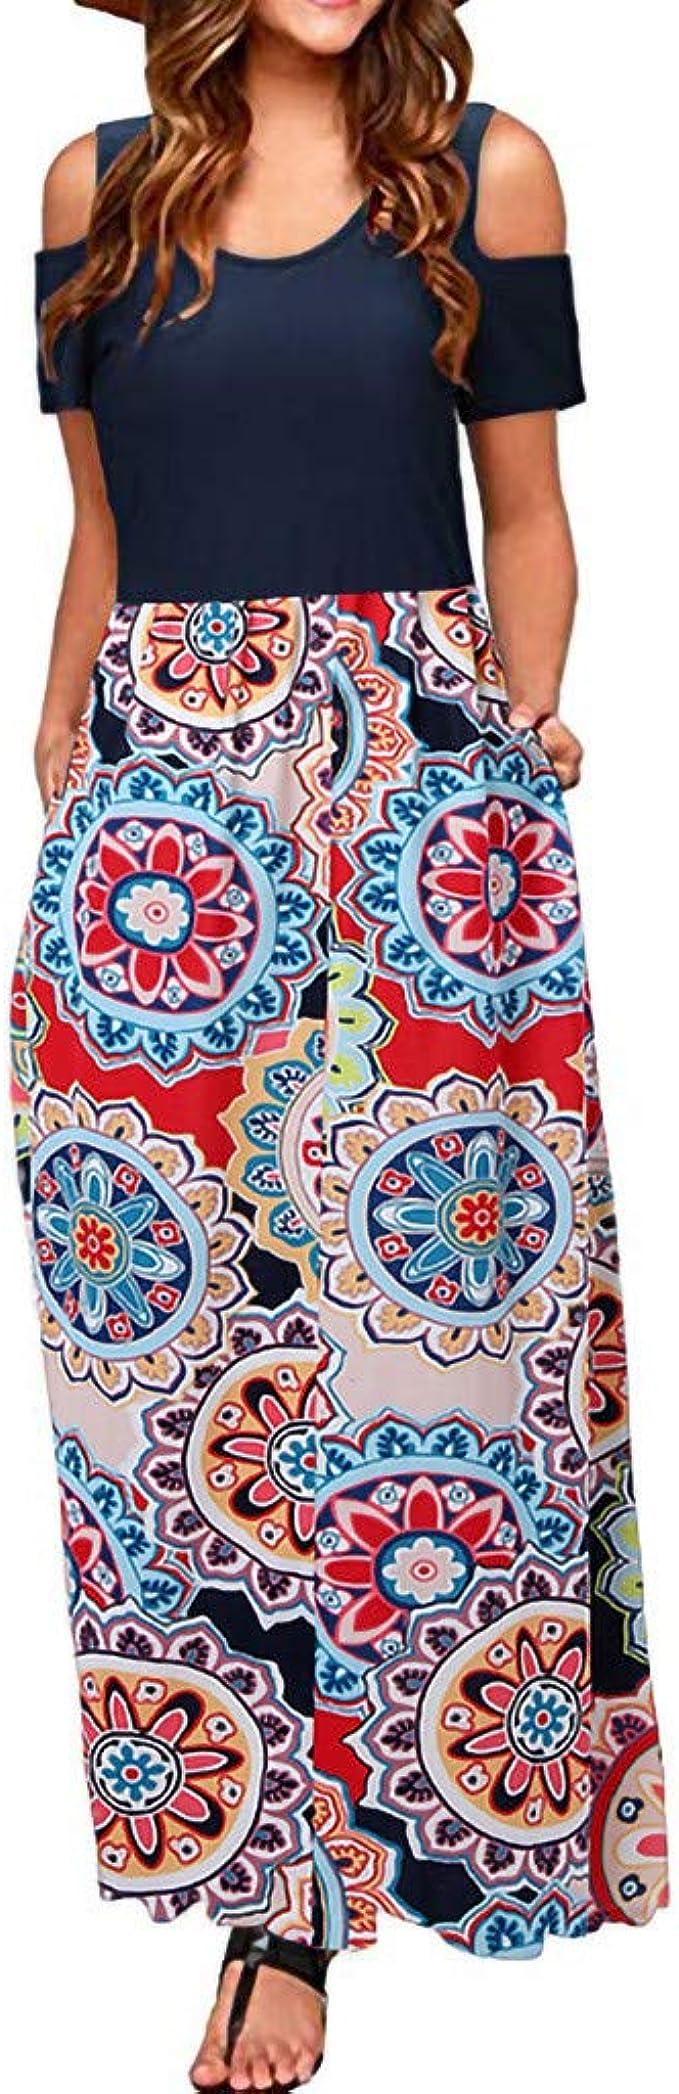 Shusuen Casual Dress for Women Elegant A Line Sleeve V Neck Ruffles Plus Size Casual Maxi Prom